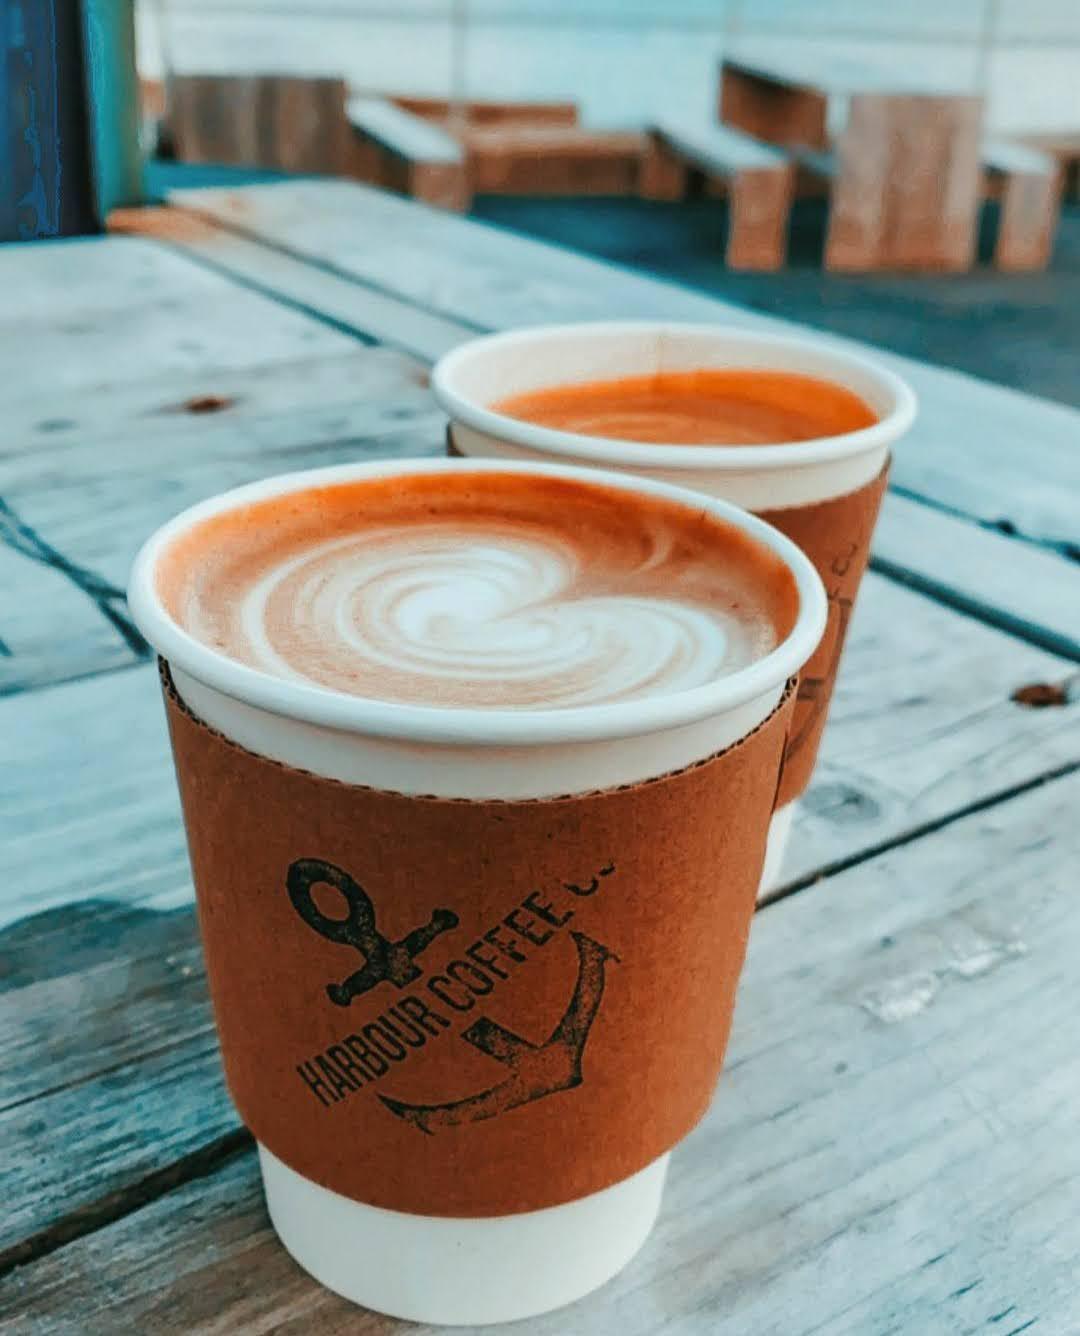 Harbour Coffee Company